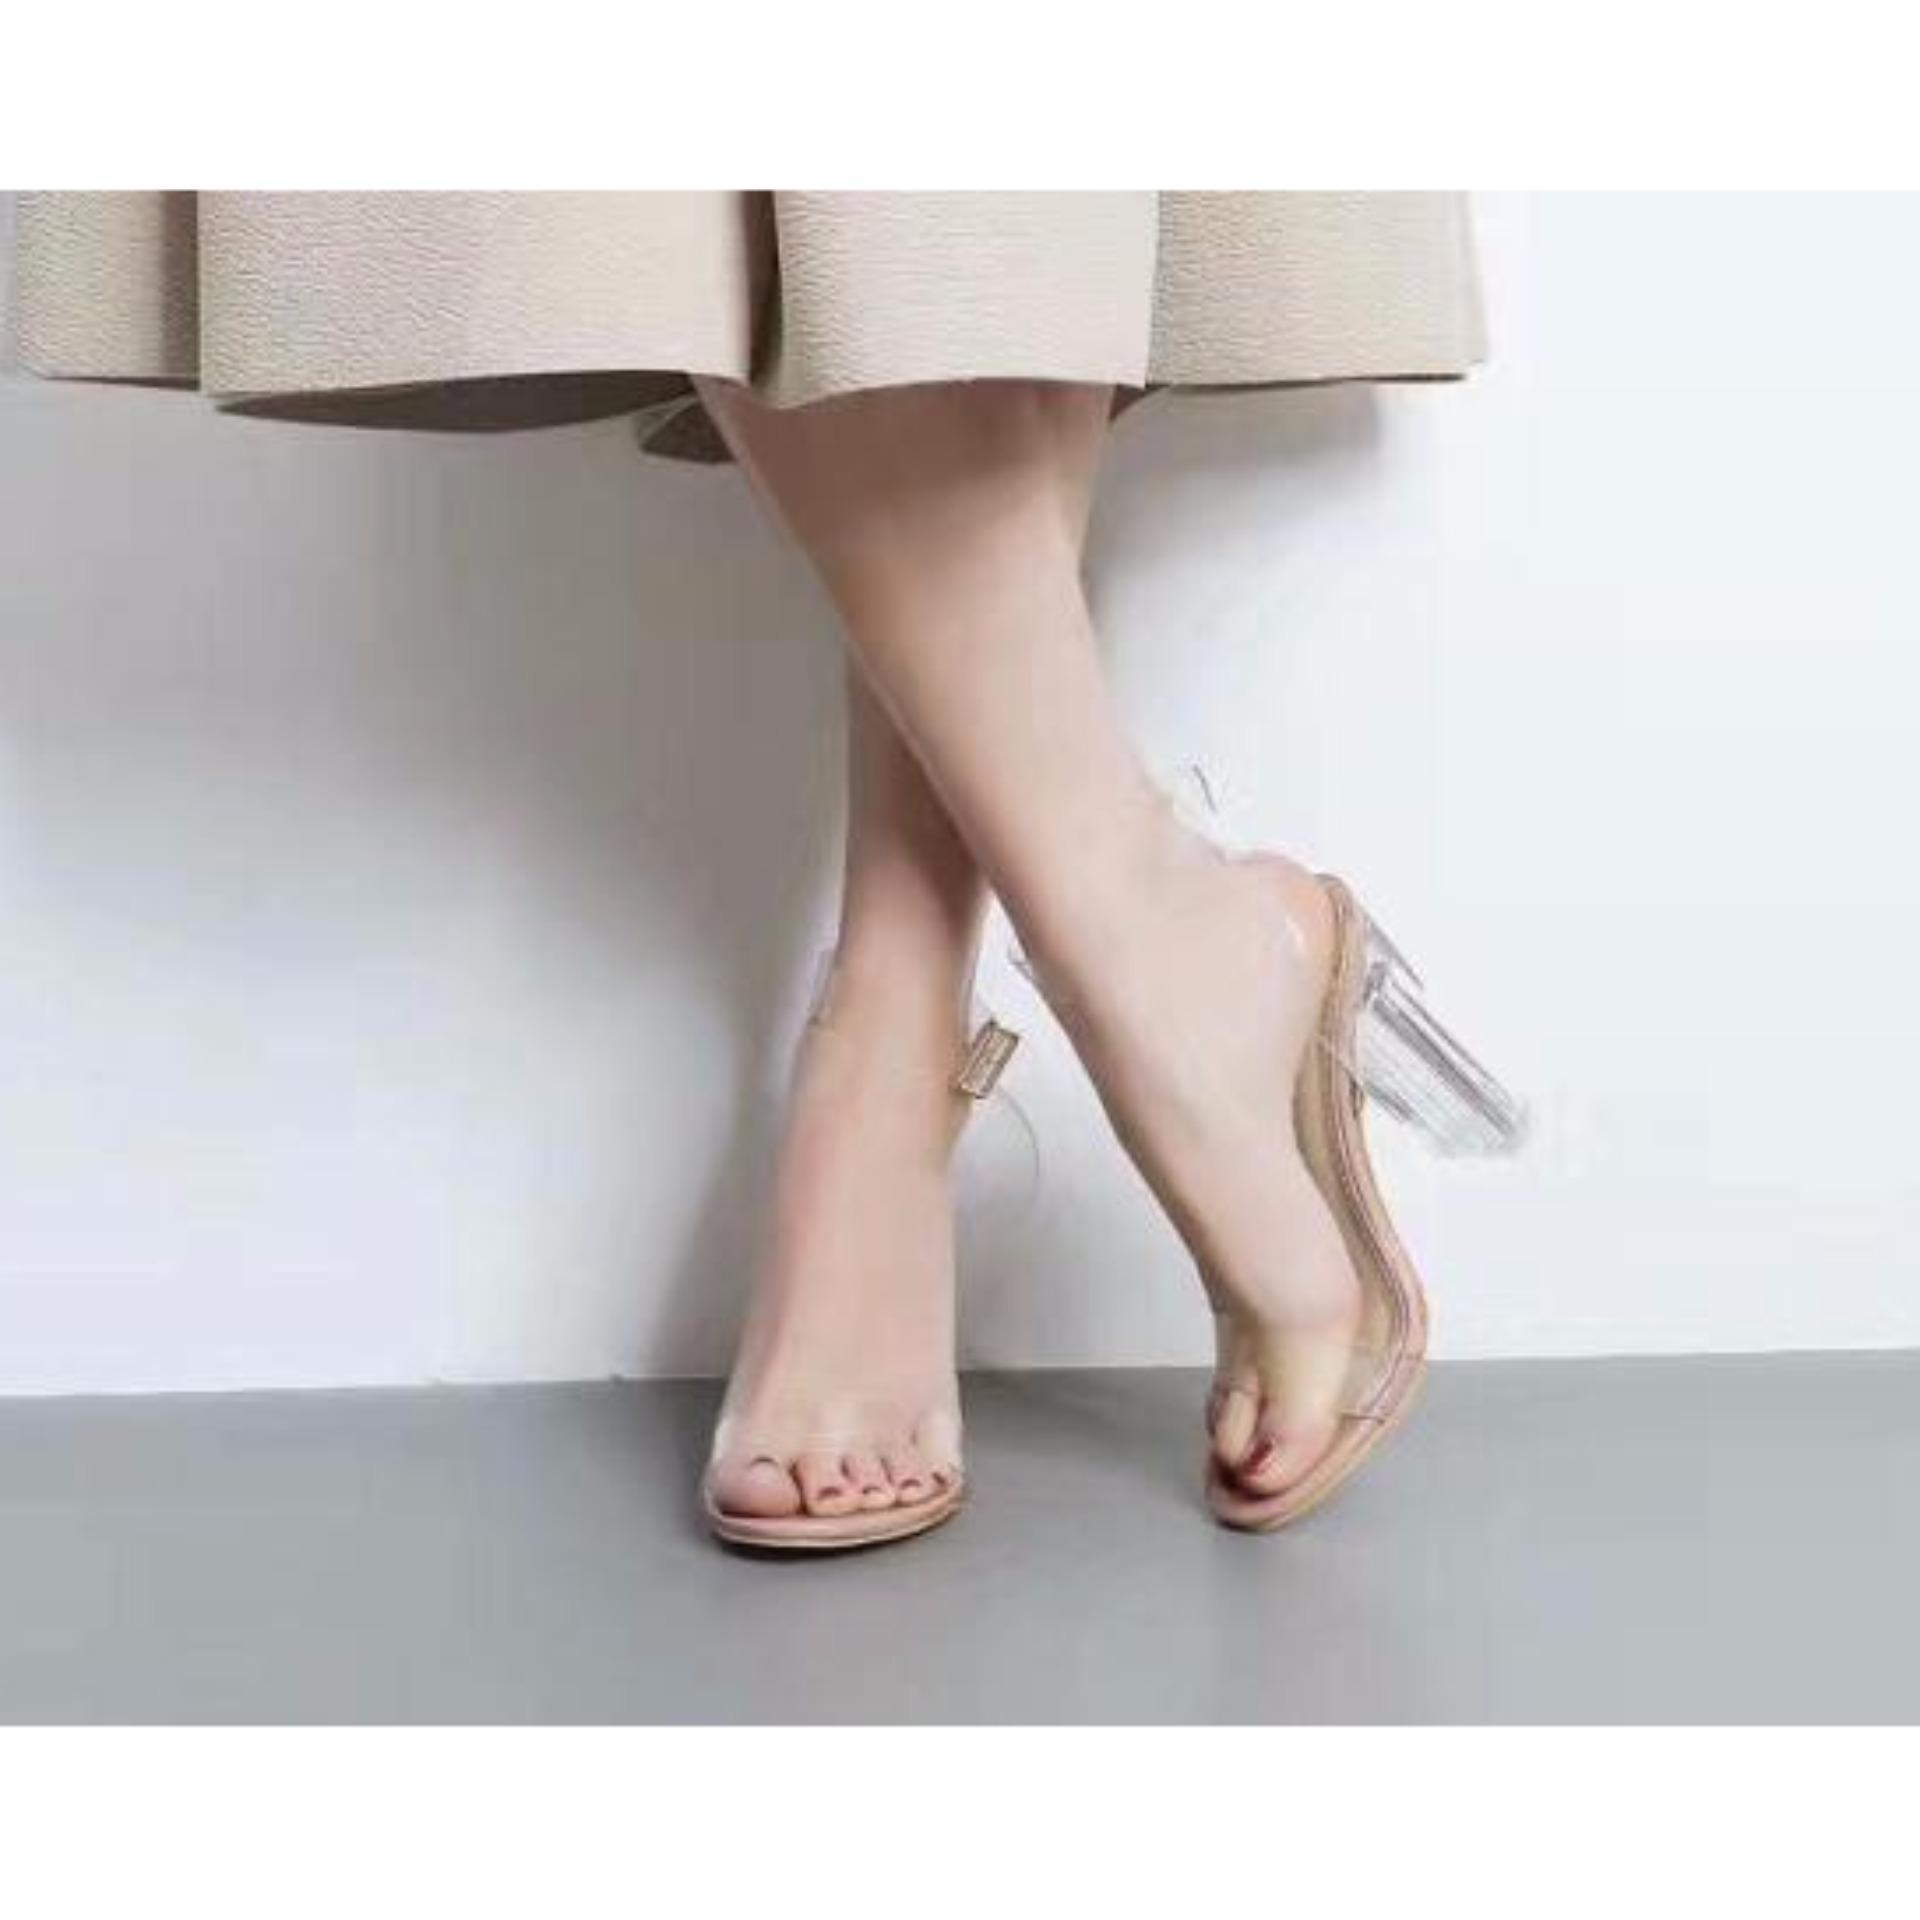 Giày cao gót Trong 7P quai Trong-màu kem